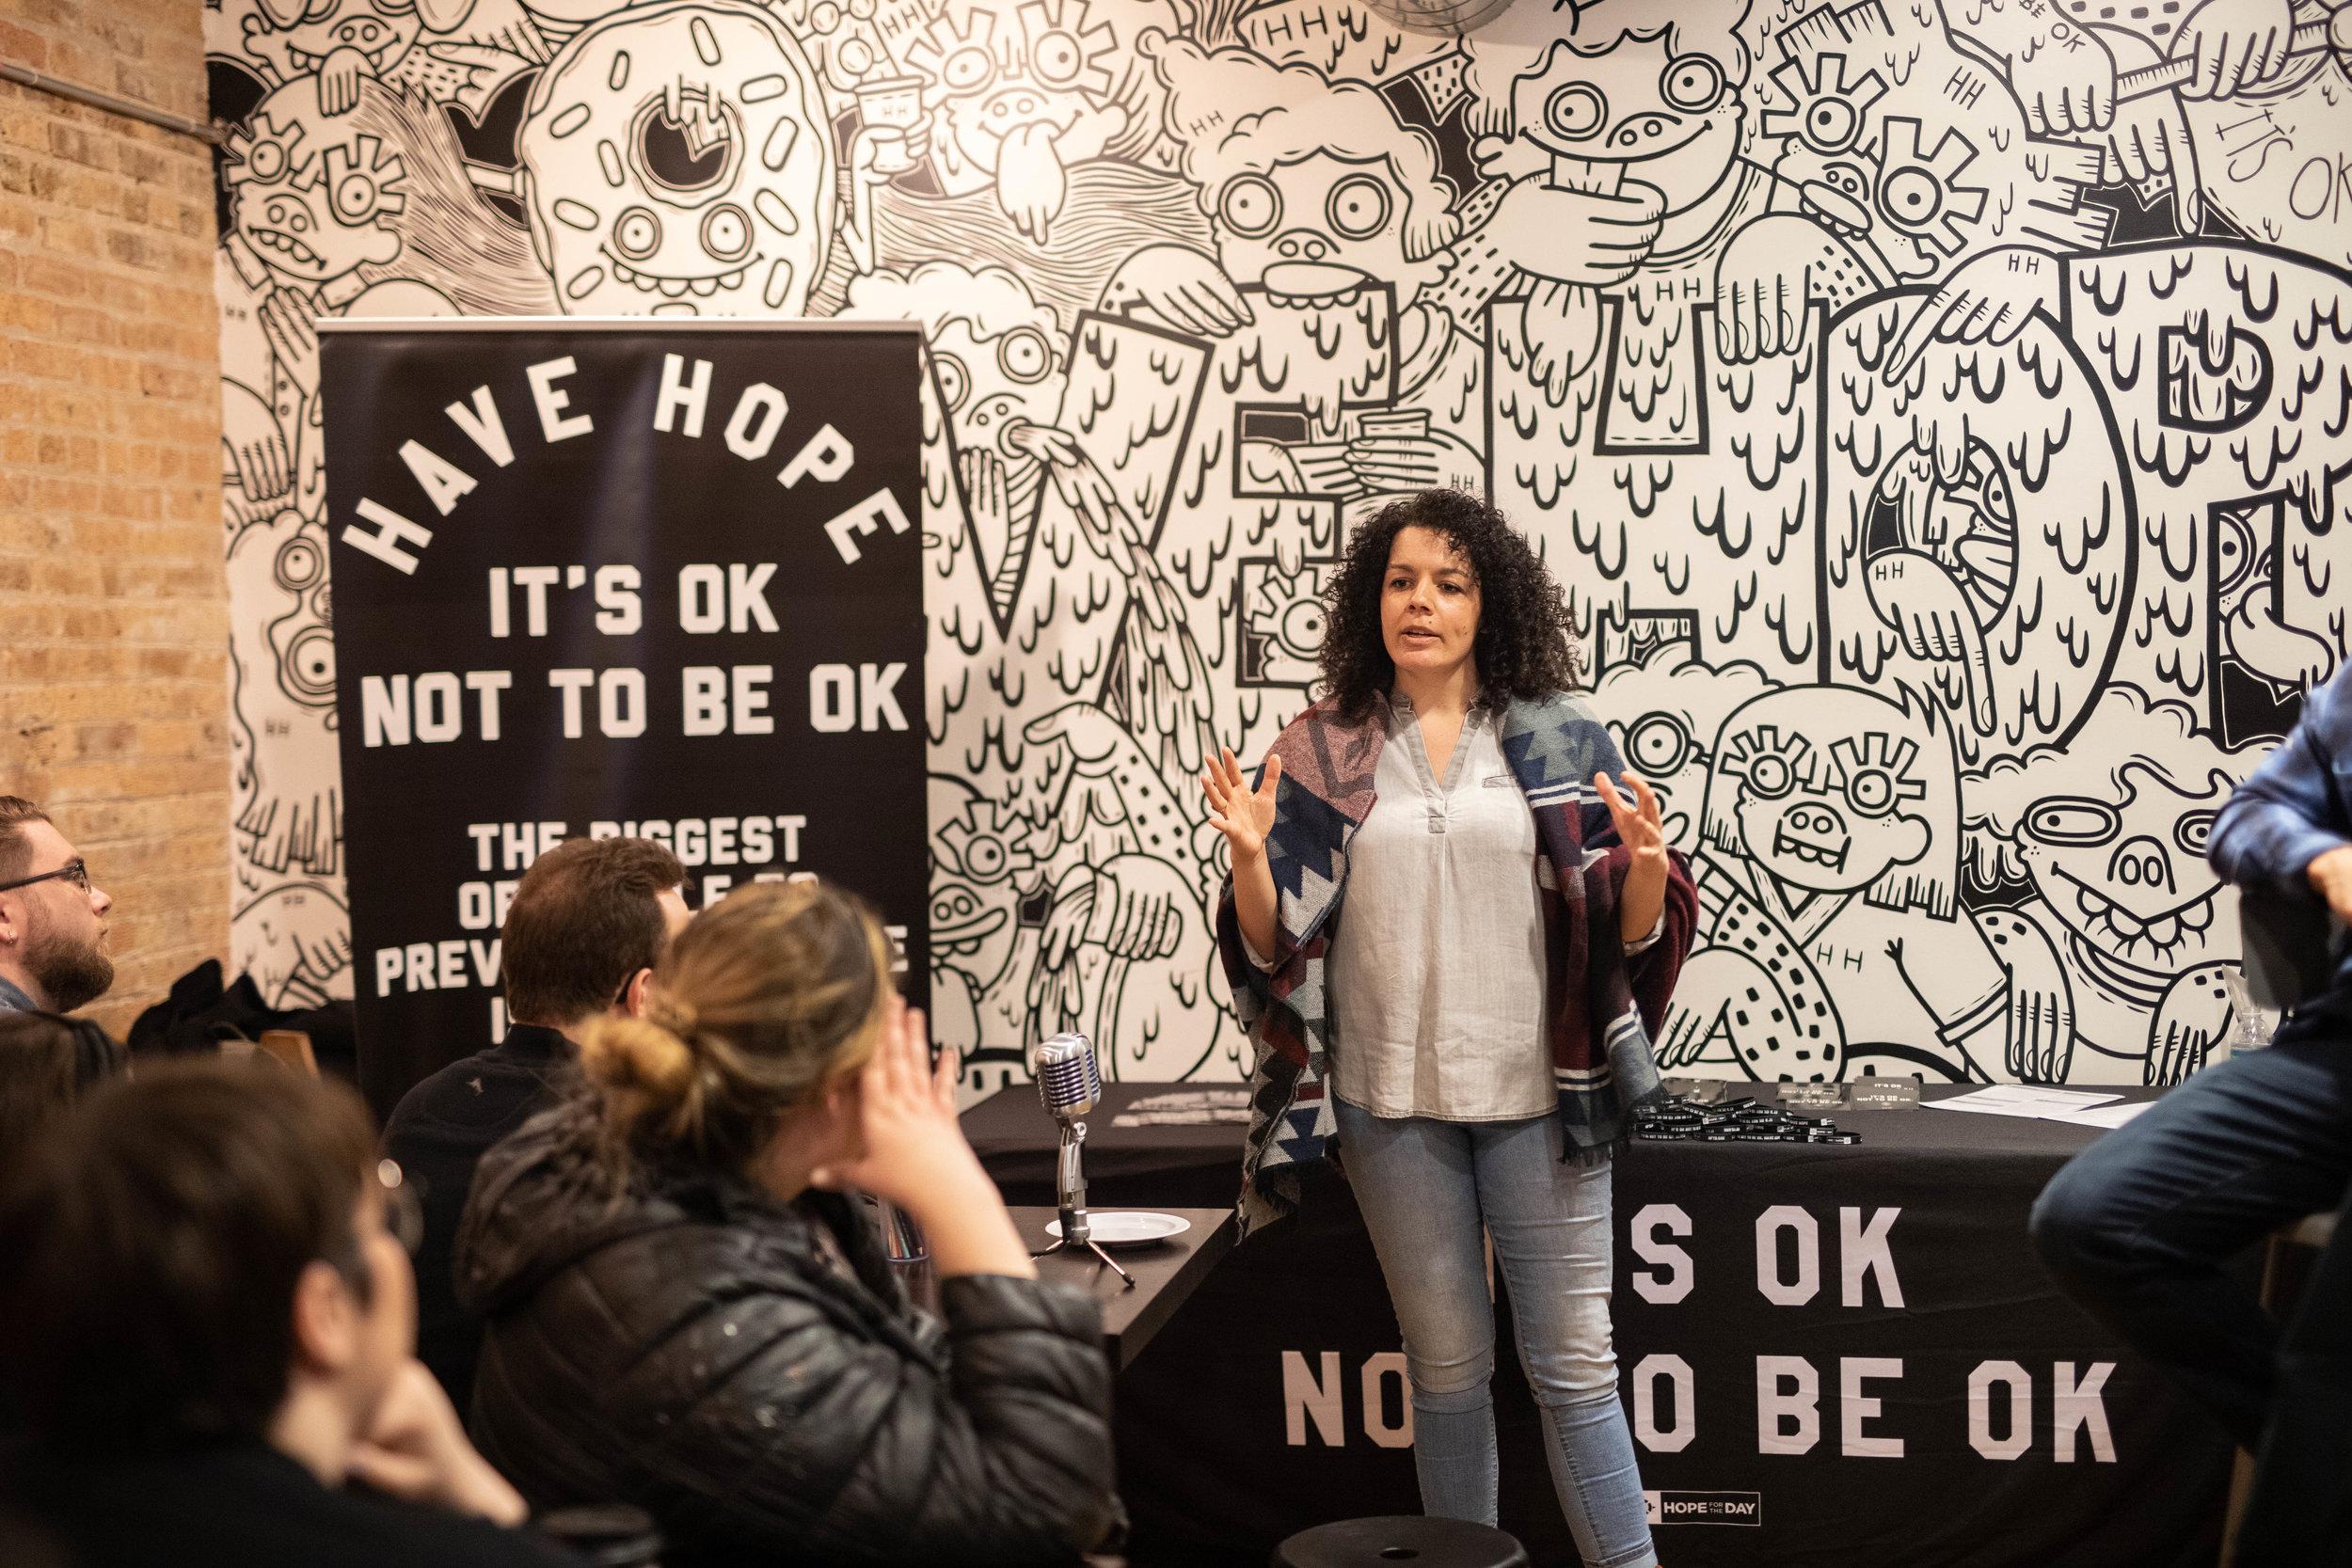 Art Therapist, Kristen McCary of Thrive Art Therapy. Photo: Kris Lori